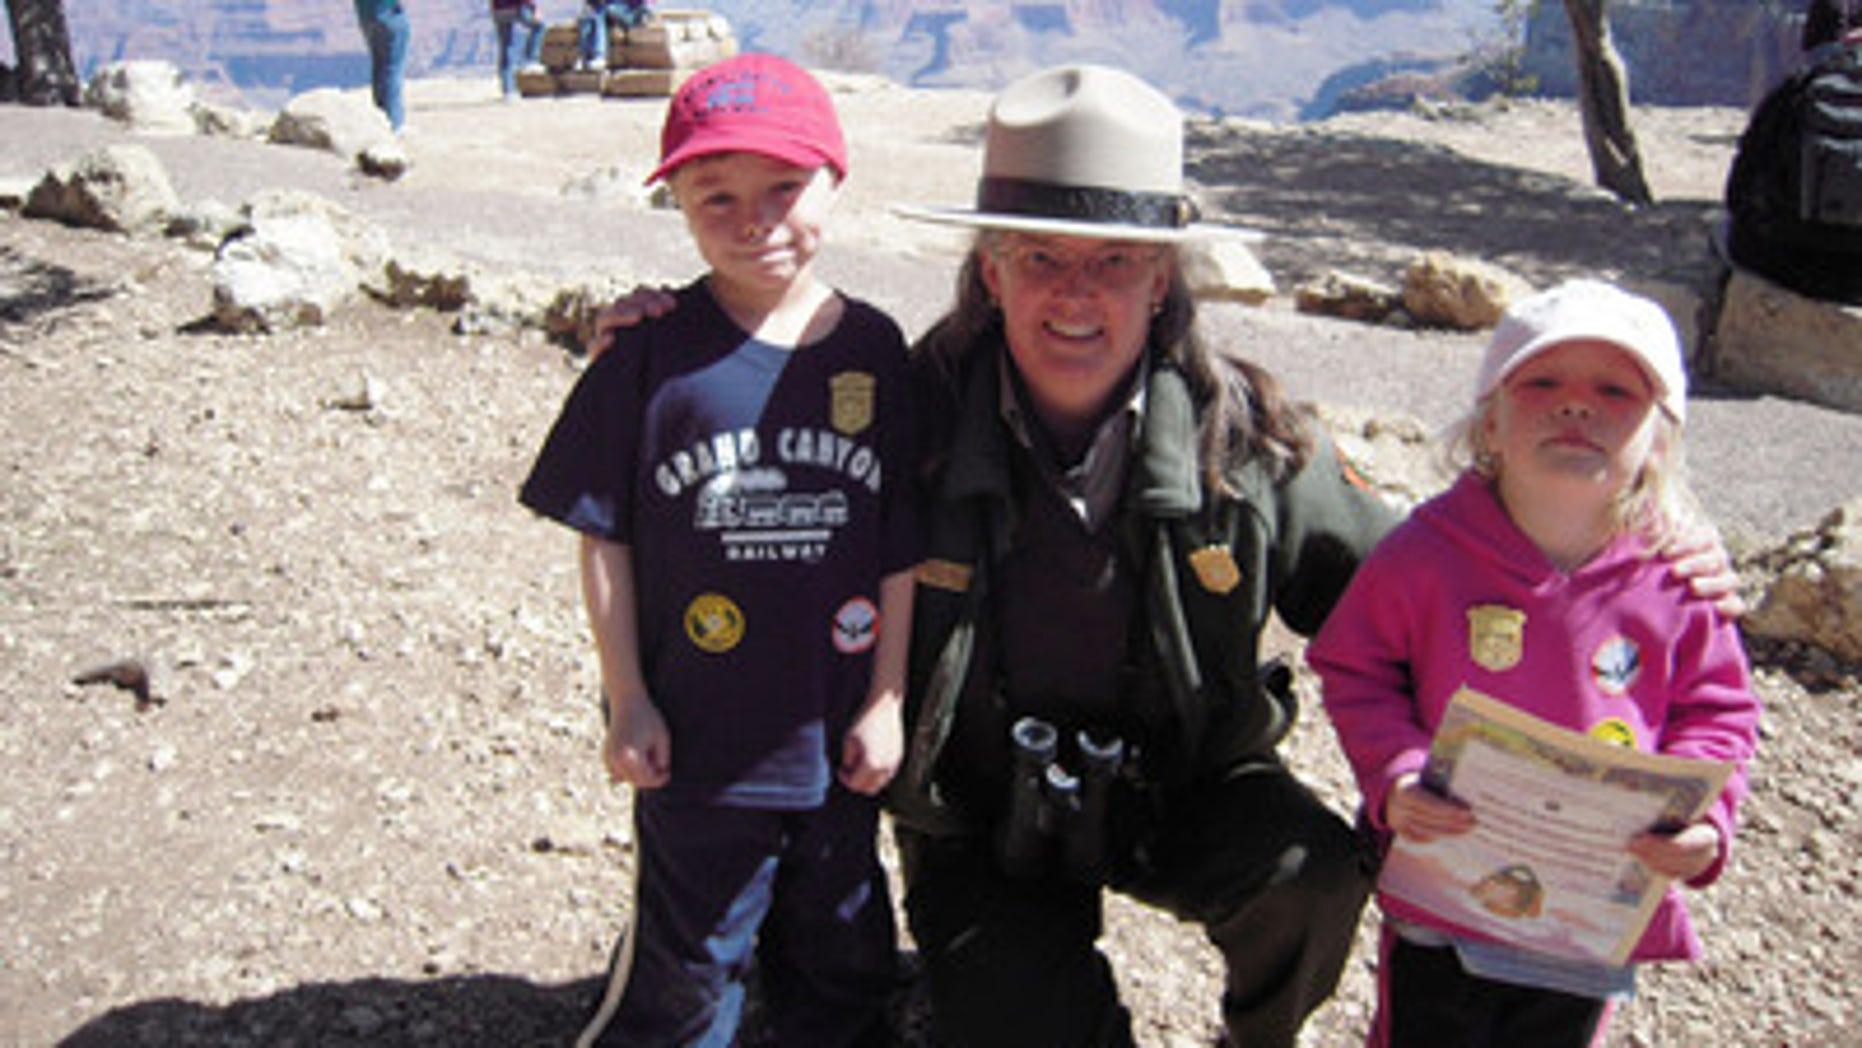 Ethan Sitzman and his sister Hannah with a park ranger at Grand Canyon. Part of the Junior Ranger program.